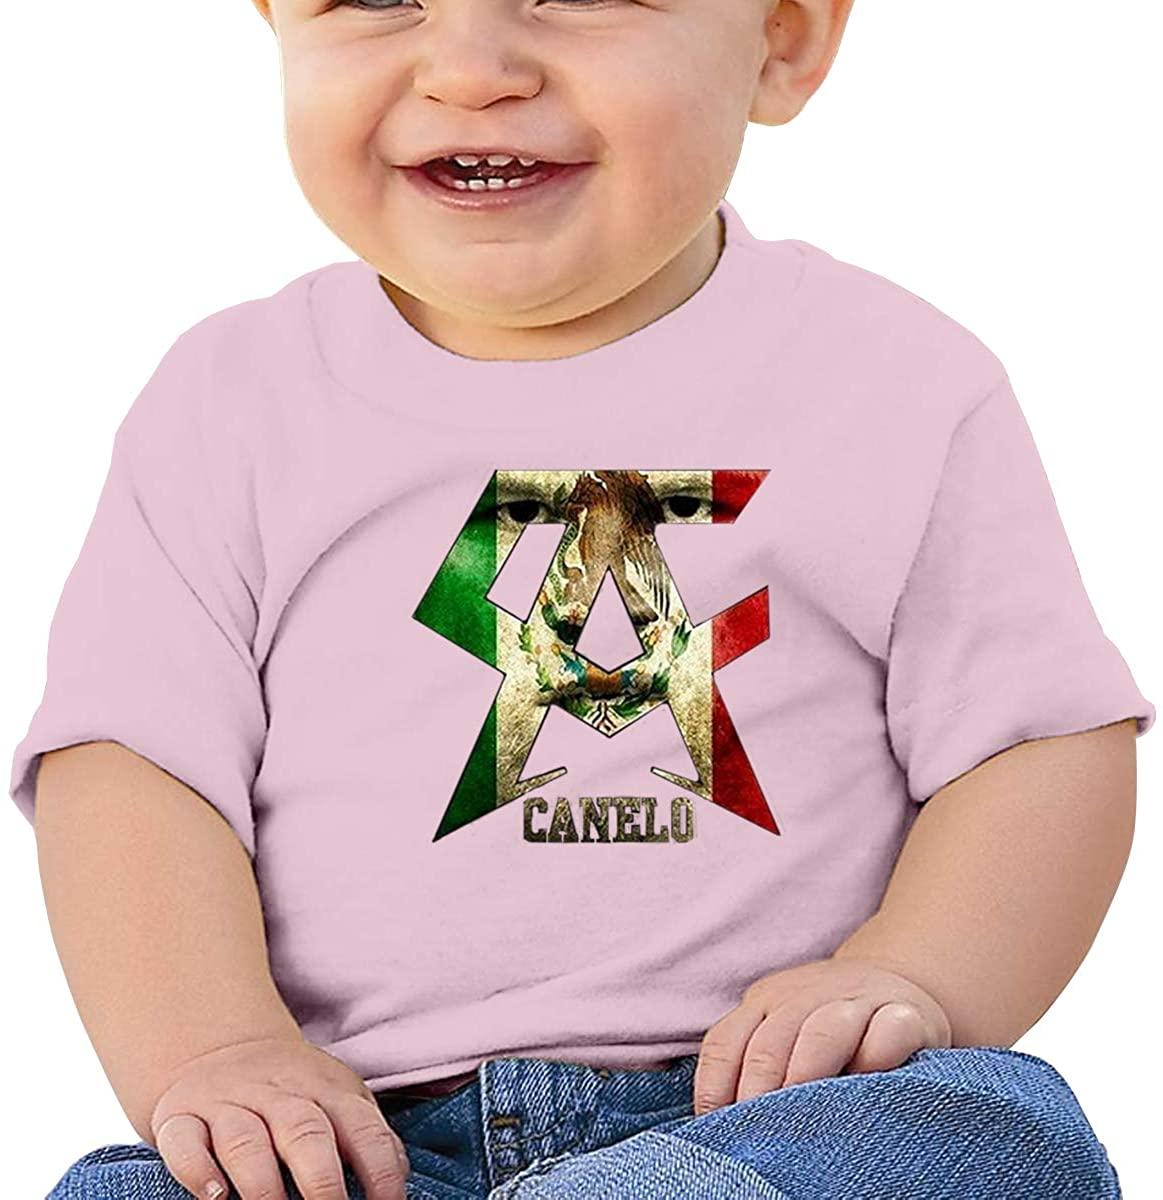 6-24 Months Boy and Girl Baby Short Sleeve T-Shirt Canelo Alvarez Elegant and Simple Design Pink